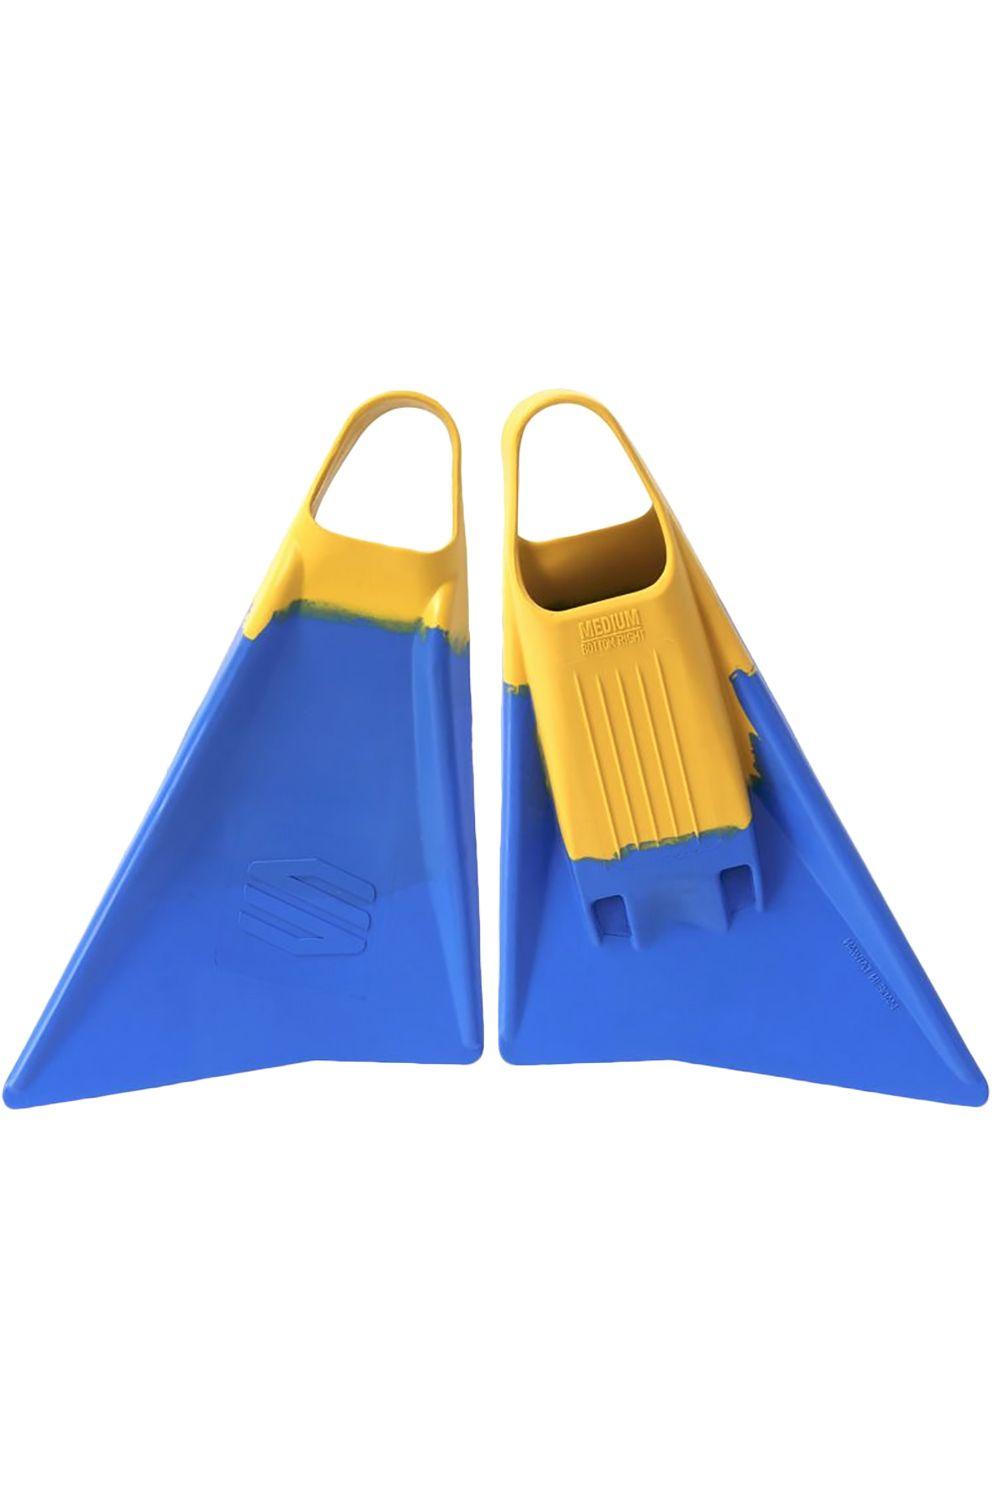 Sniper Bodyboard Fins SNIPER FINS Blue/Yellow